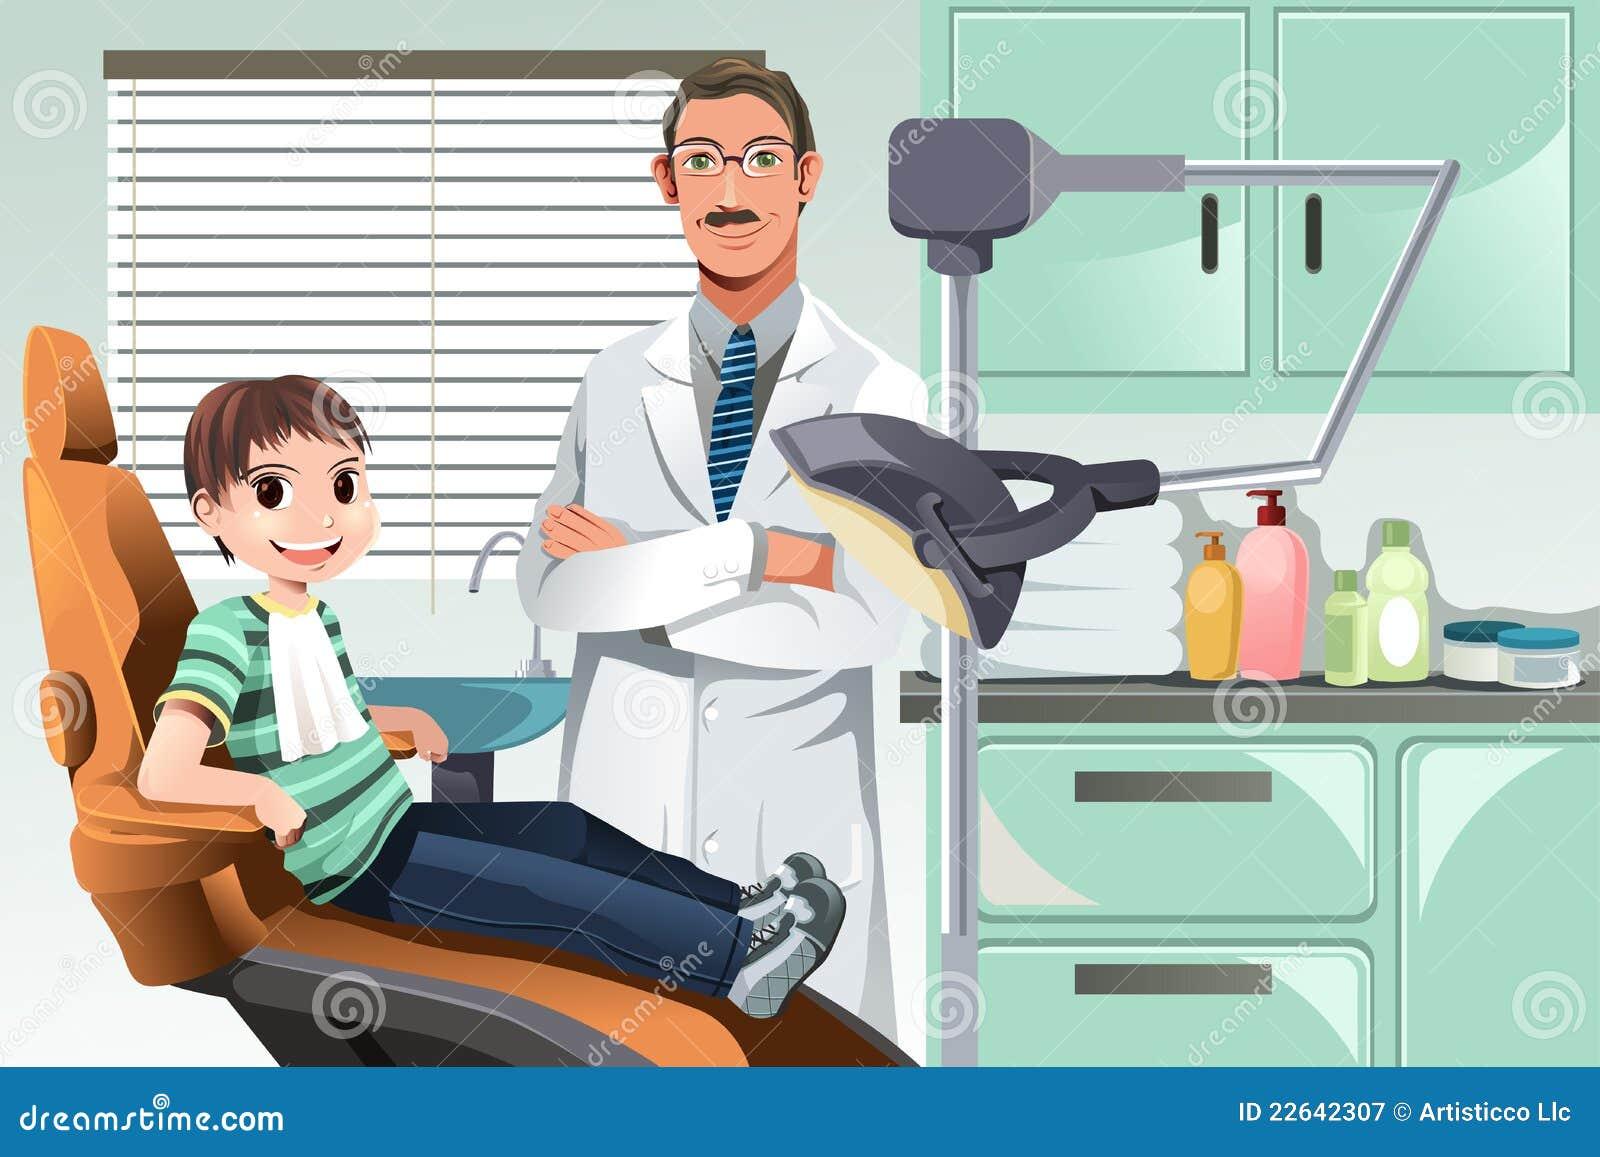 Dental Clinic Interior Design By Ylab besides Design furthermore 121034308709484452 likewise Mercurystudiosinc moreover Ortho2 3. on dental office floor plans